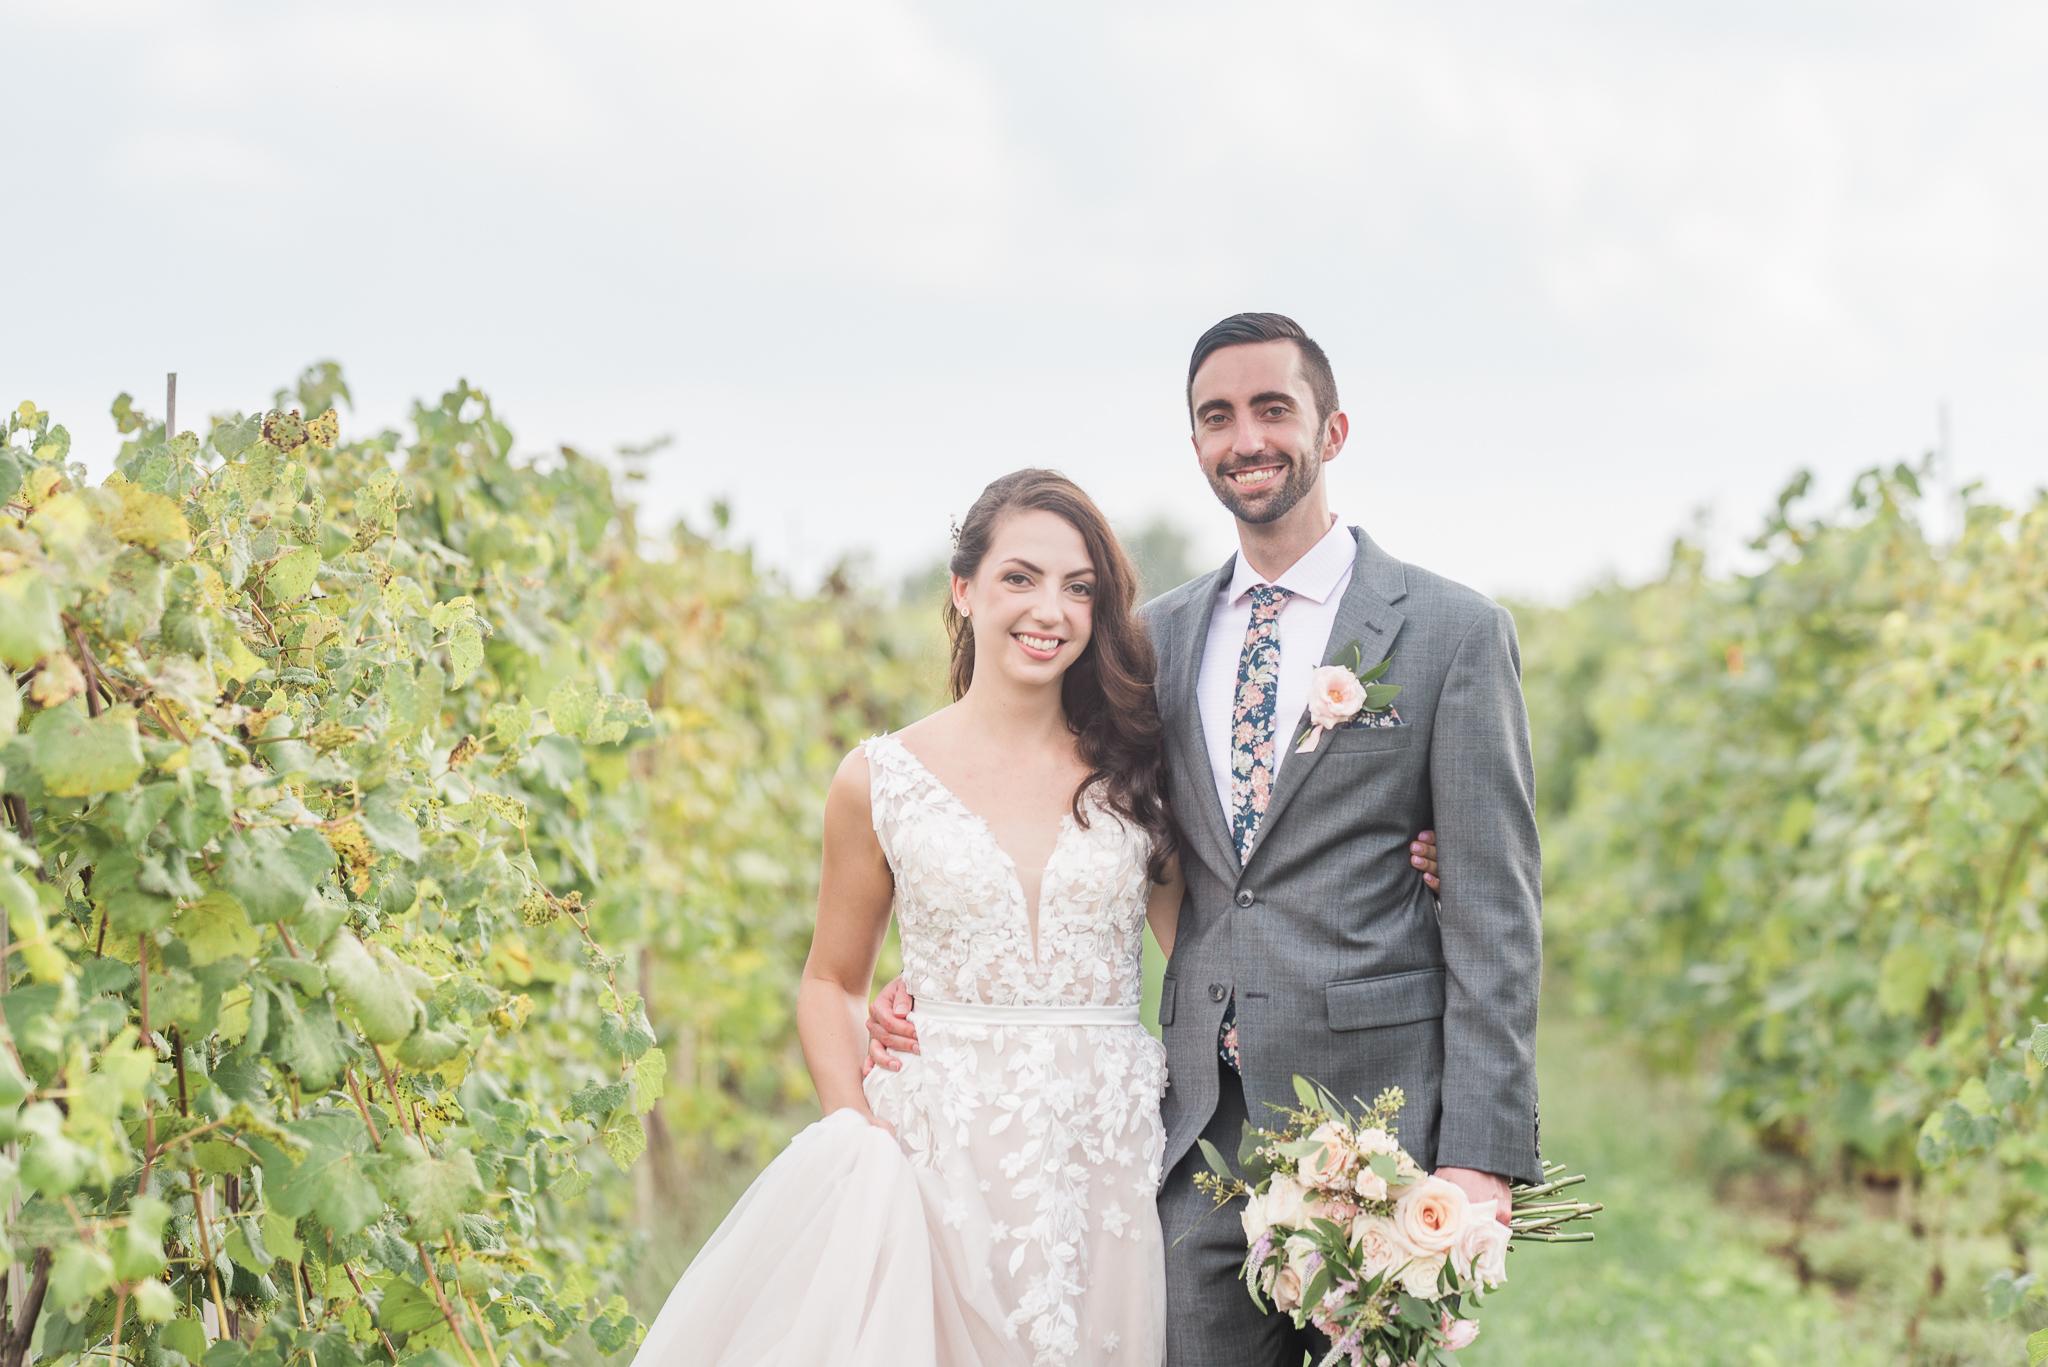 Sycamore at Mallow Run Wedding7140.jpg